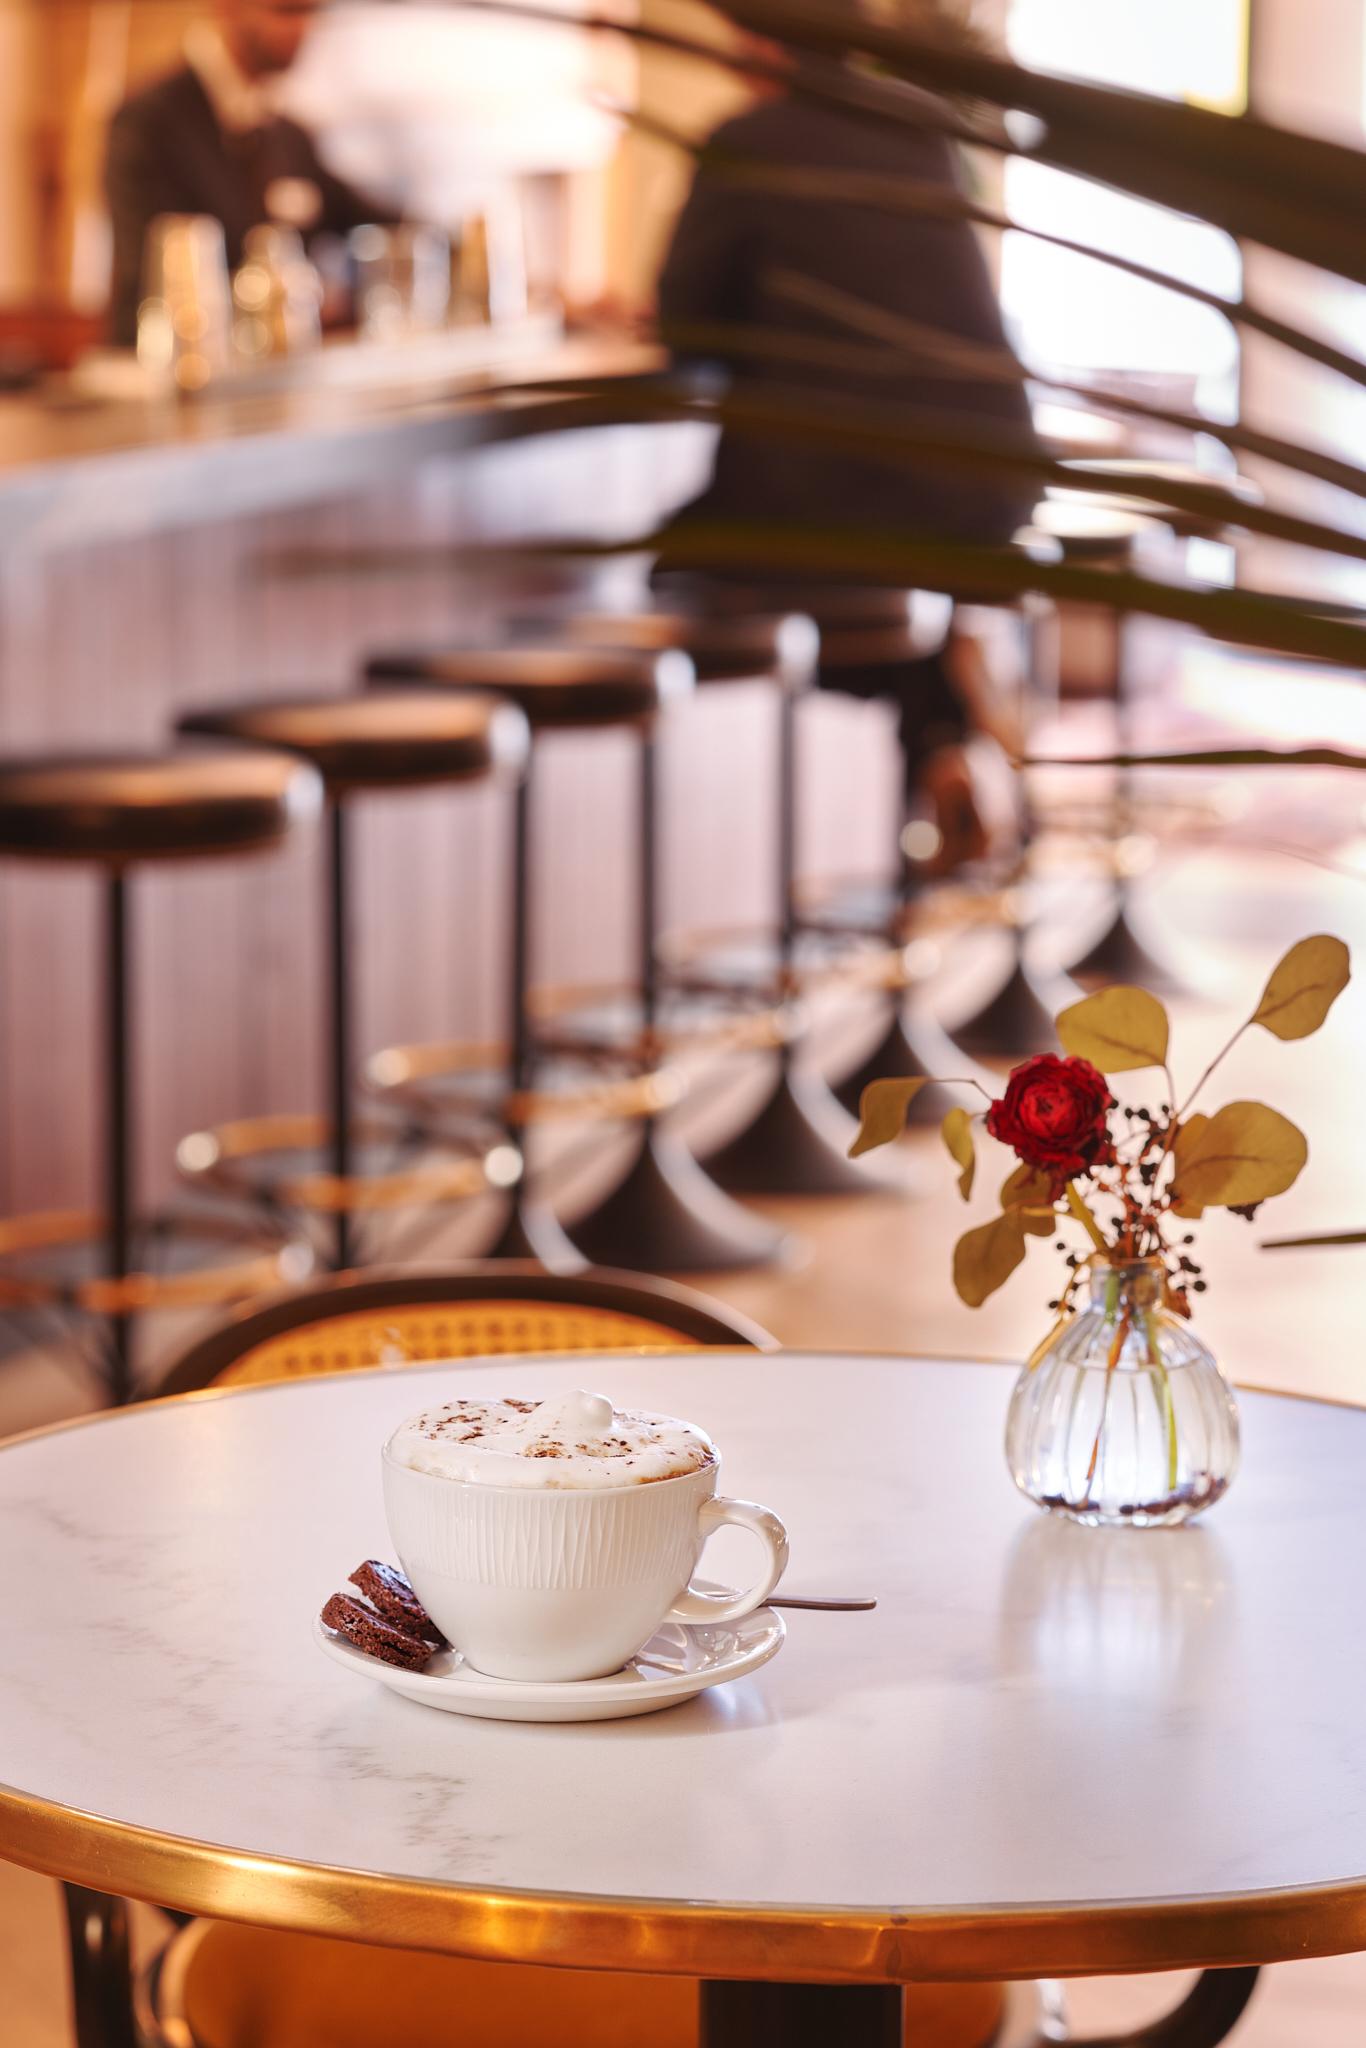 Versus Lively Lounge del Bless Hotel Madrid